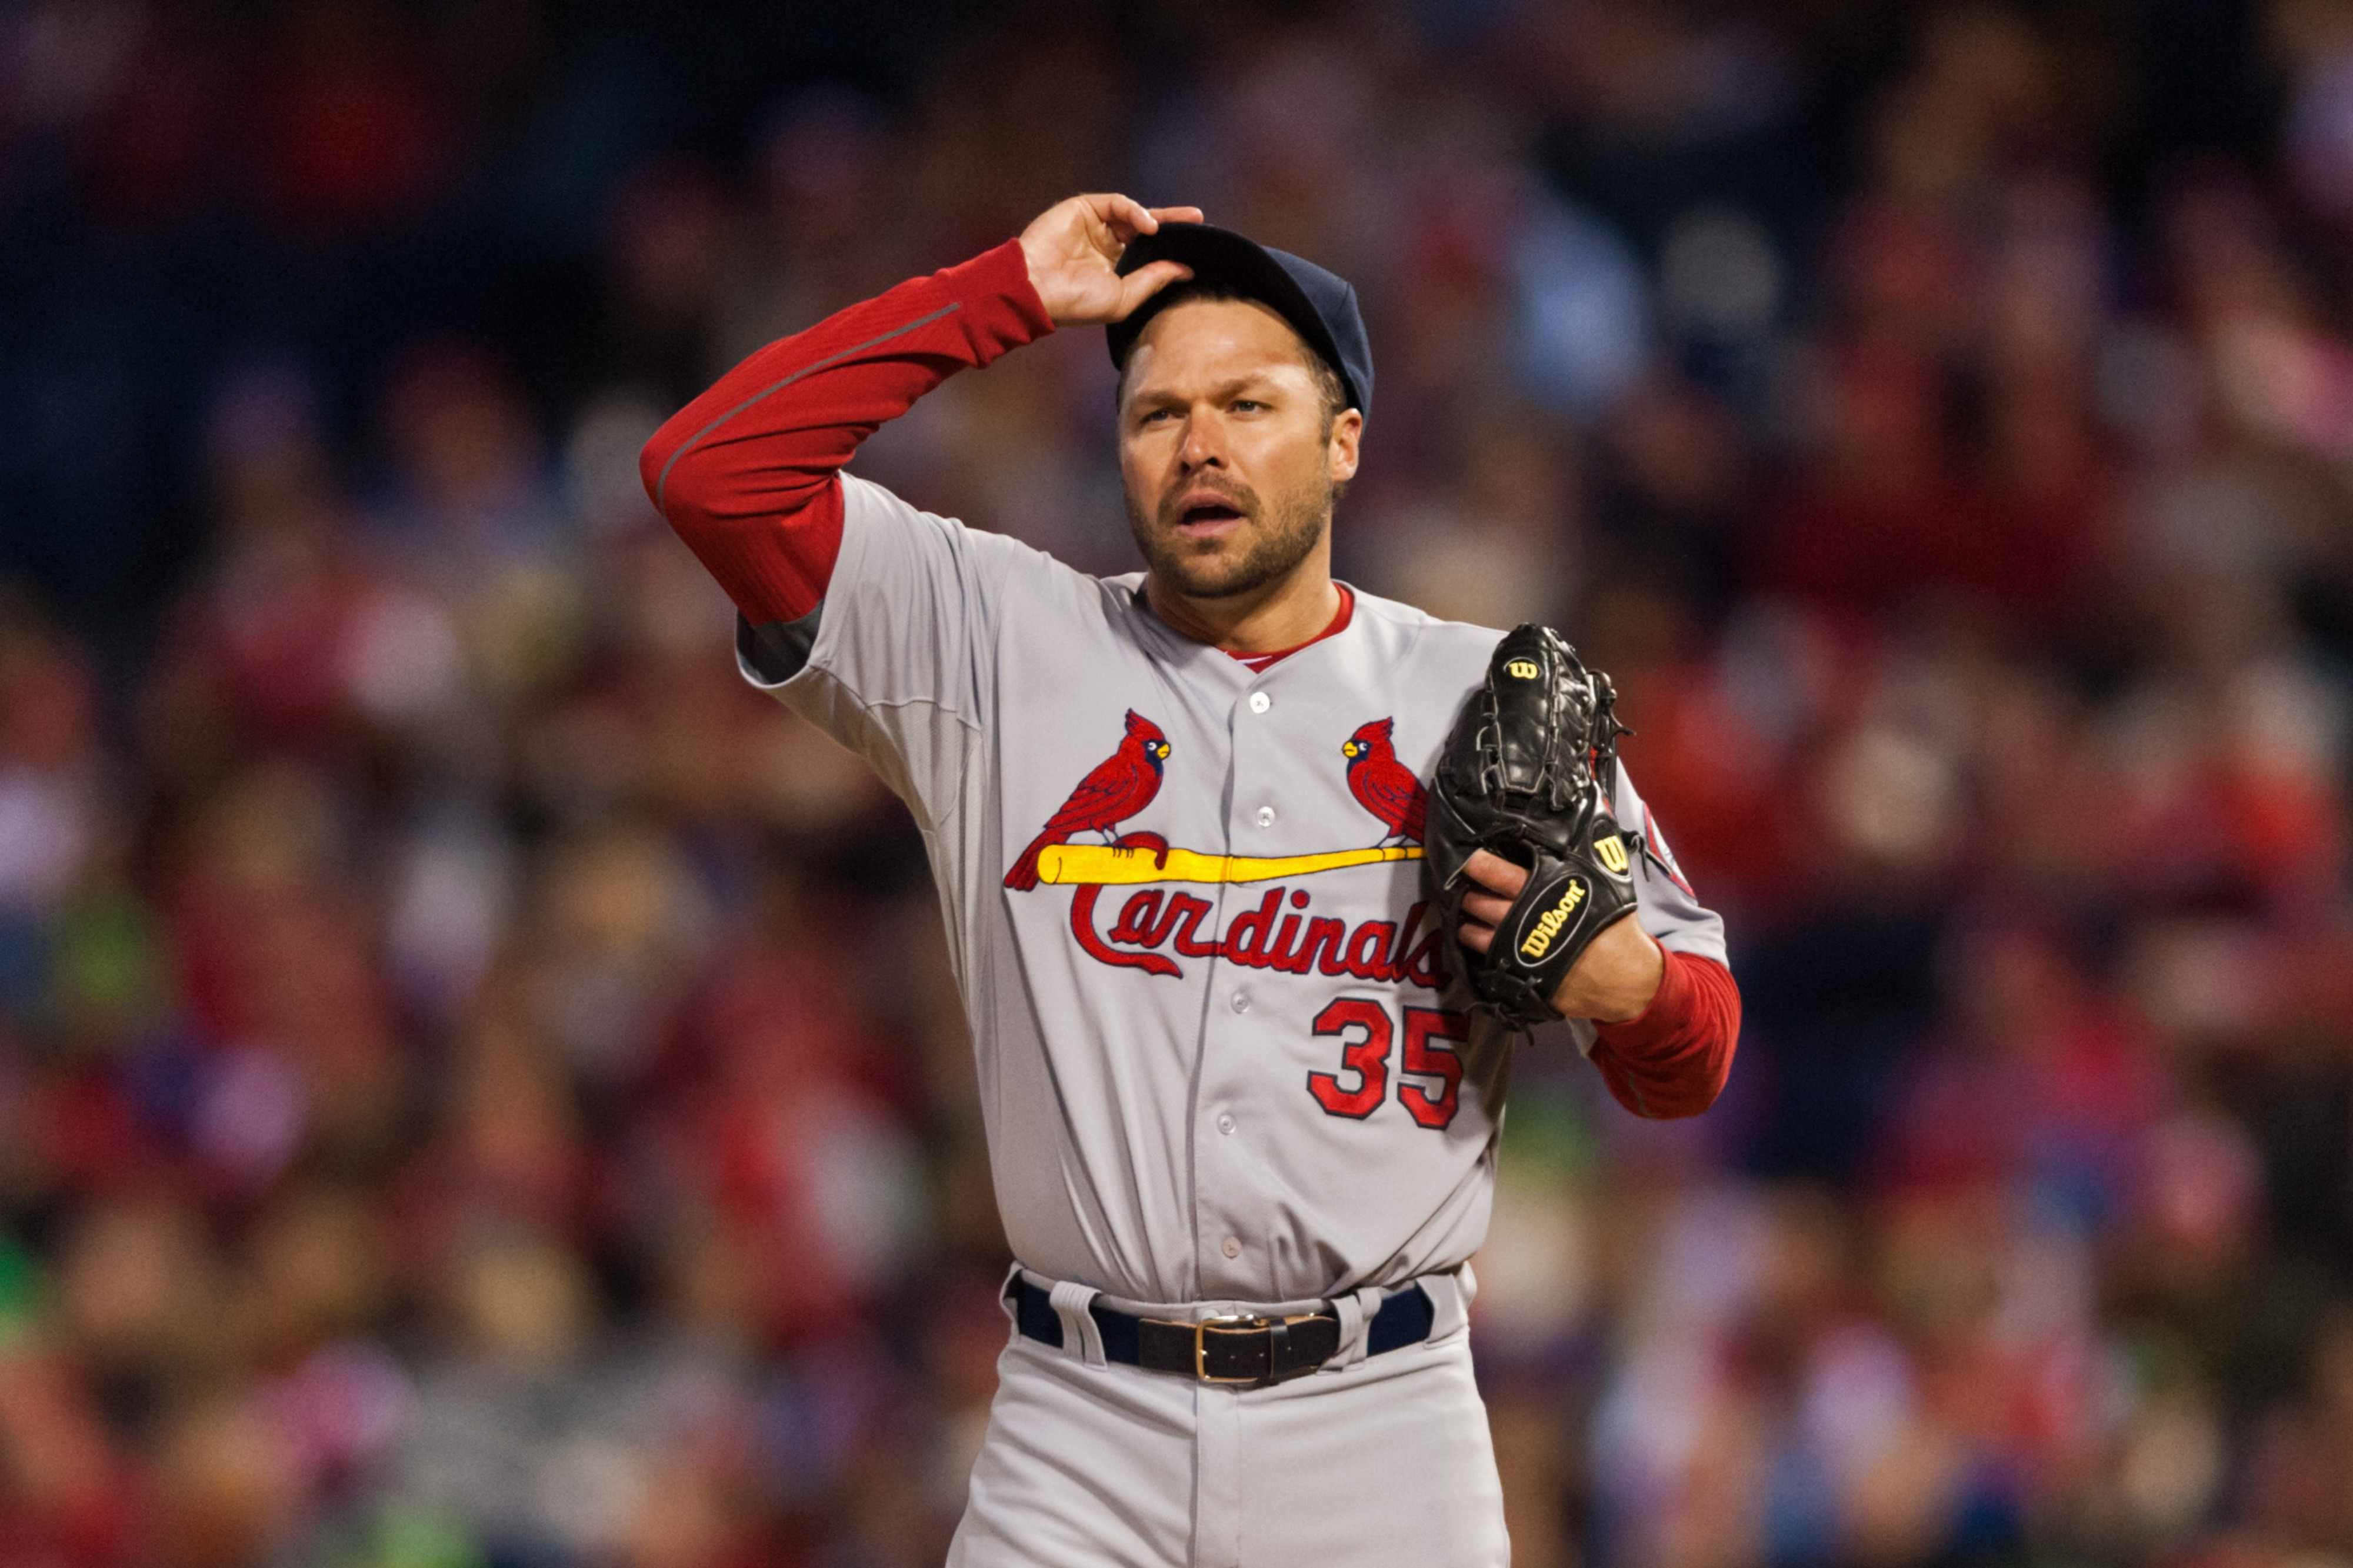 Jake Westbrook injury: Cardinals right-hander makes first rehab start